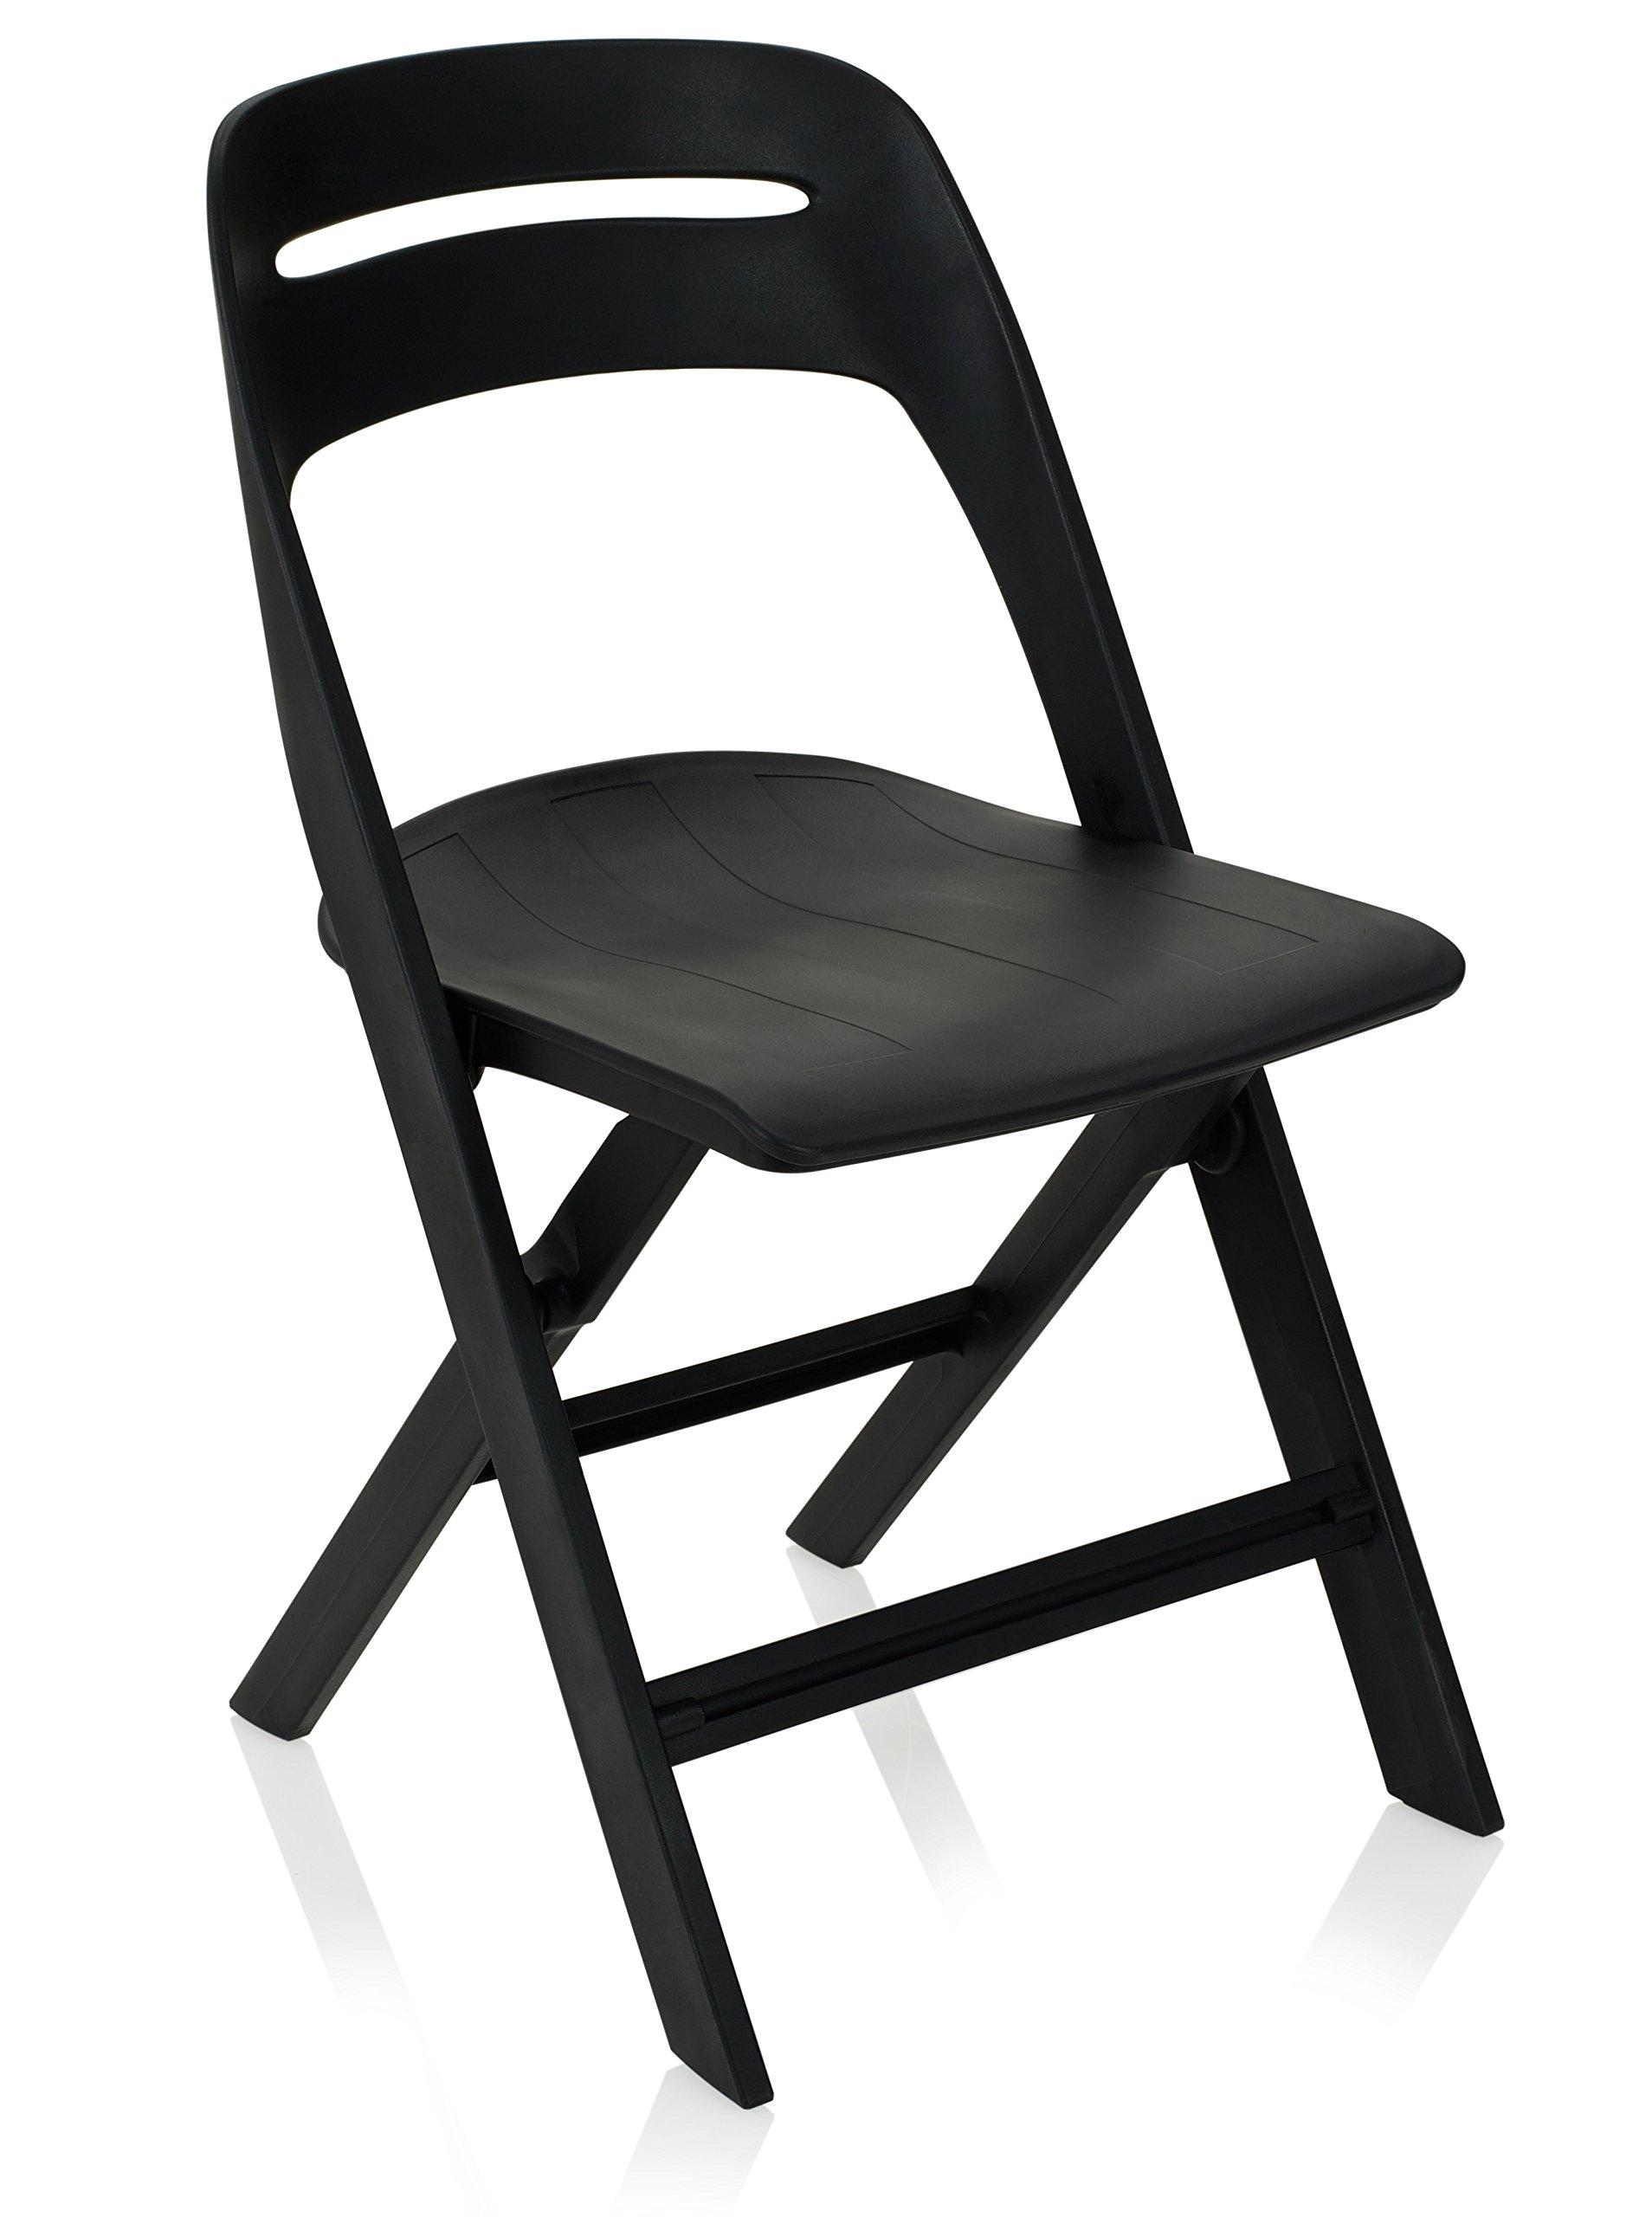 KI Novite Plastic Folding Chair (5 Pack), 20.5'' x 18.25'' x 32.75'', Black